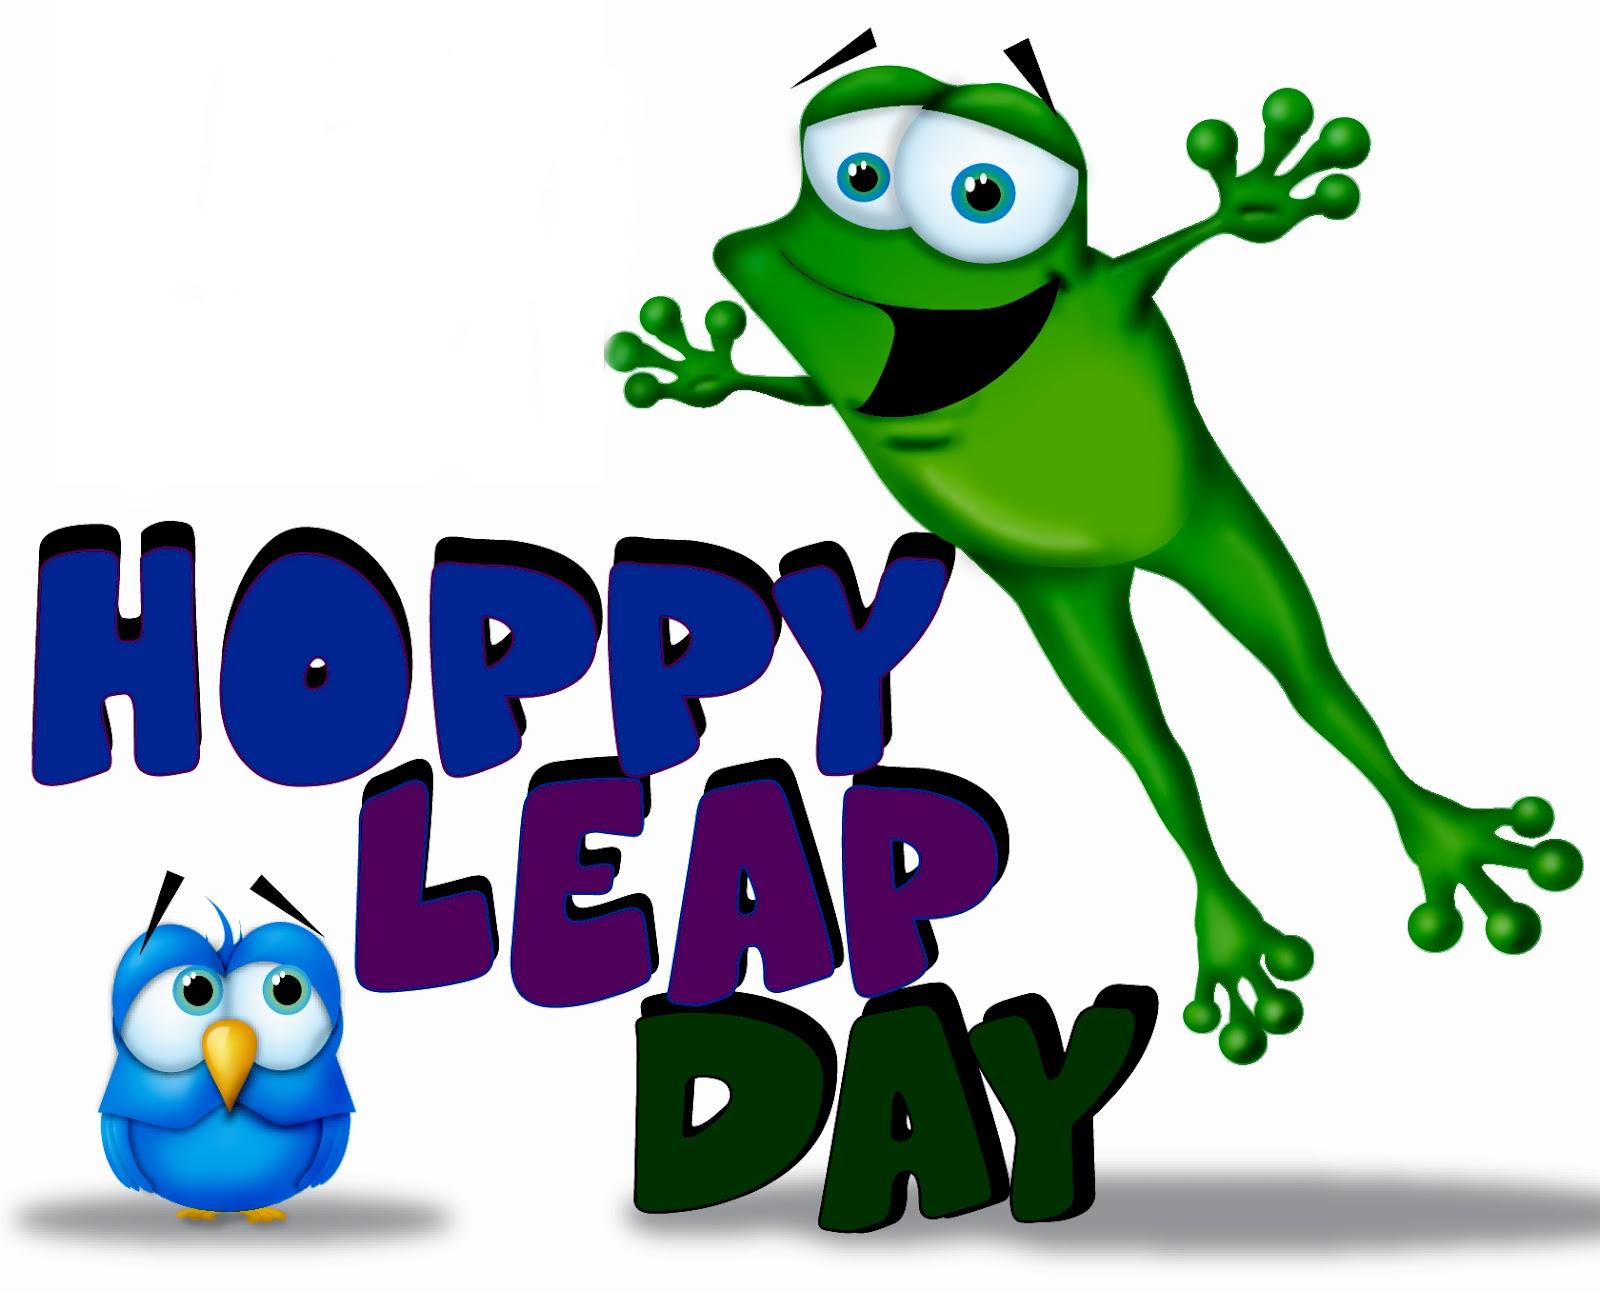 leap year - photo #14